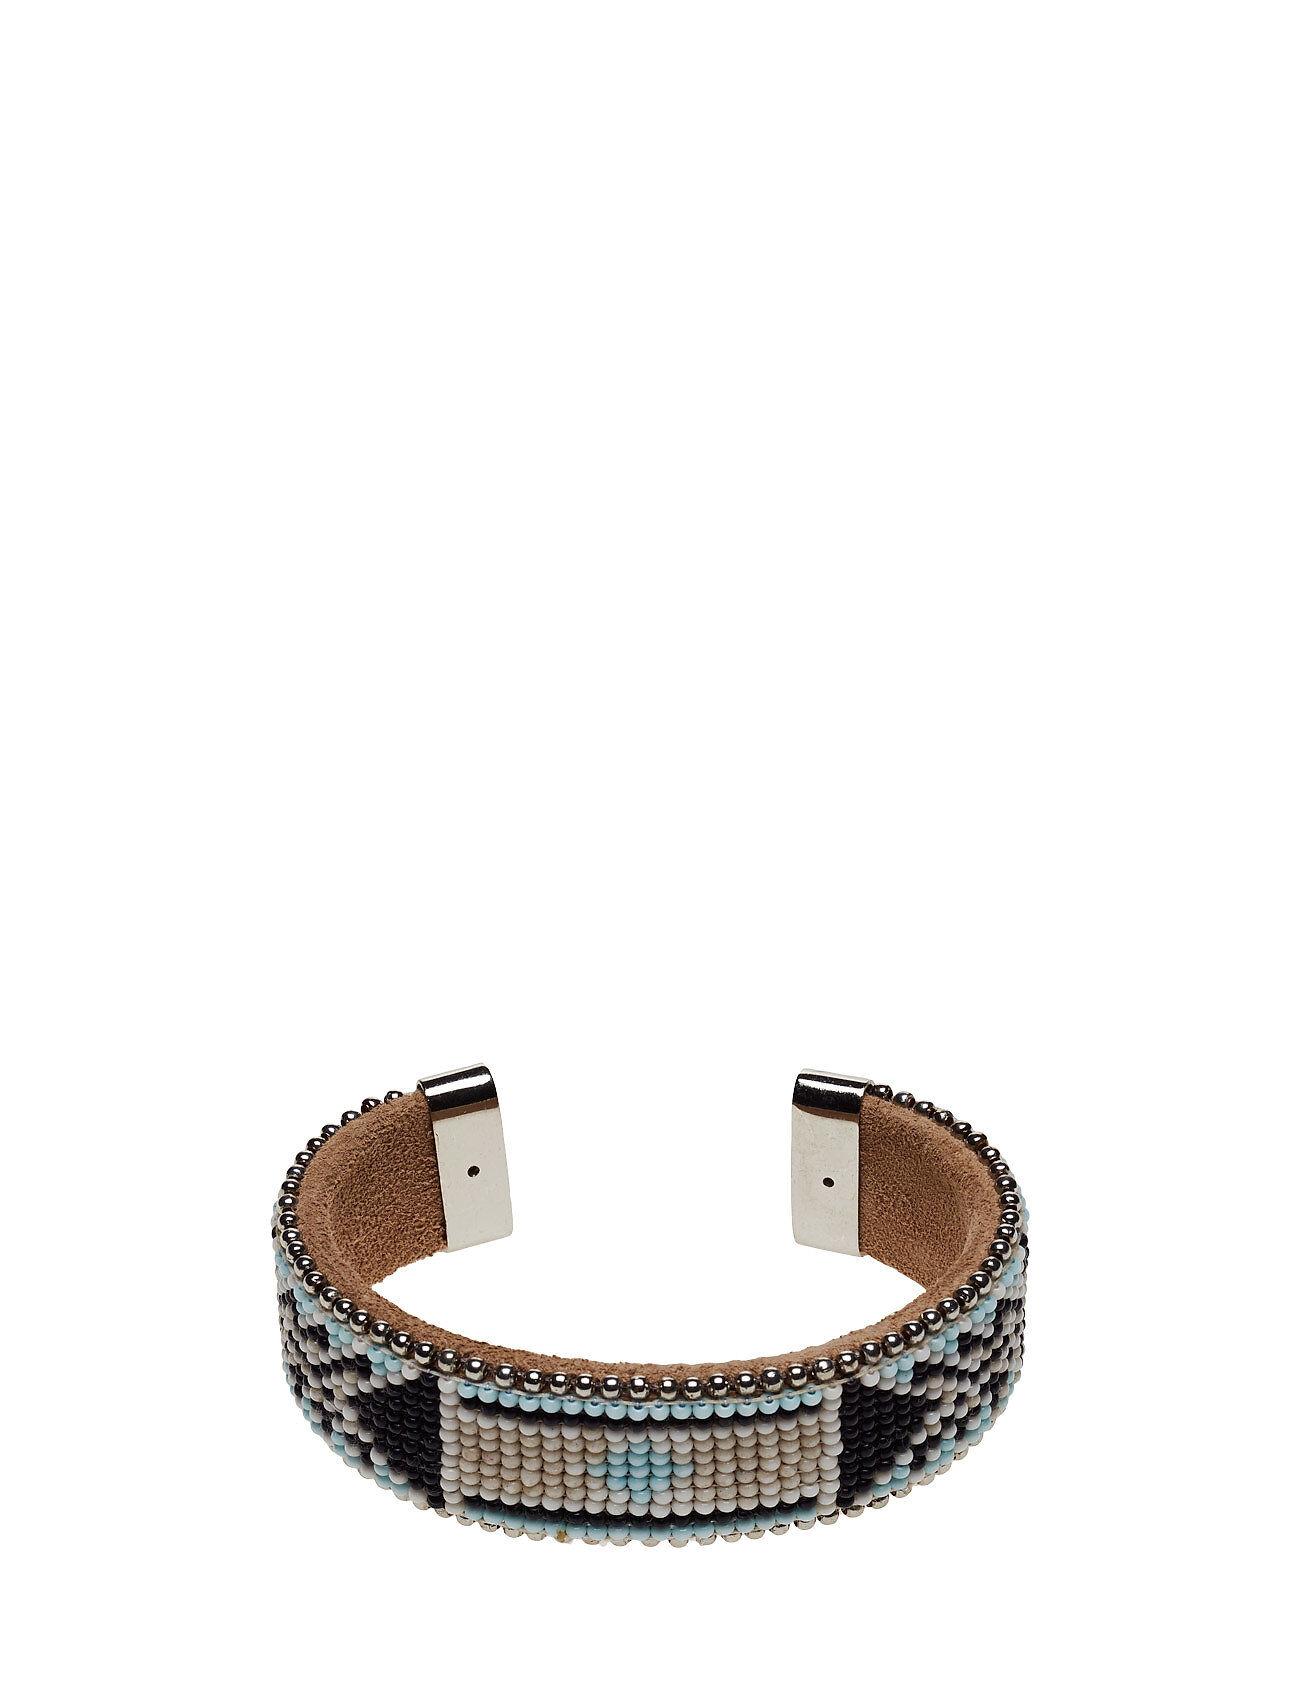 Hunkydory Naya Wide Beaded Cuff Accessories Jewellery Bracelets Bangles Musta Hunkydory